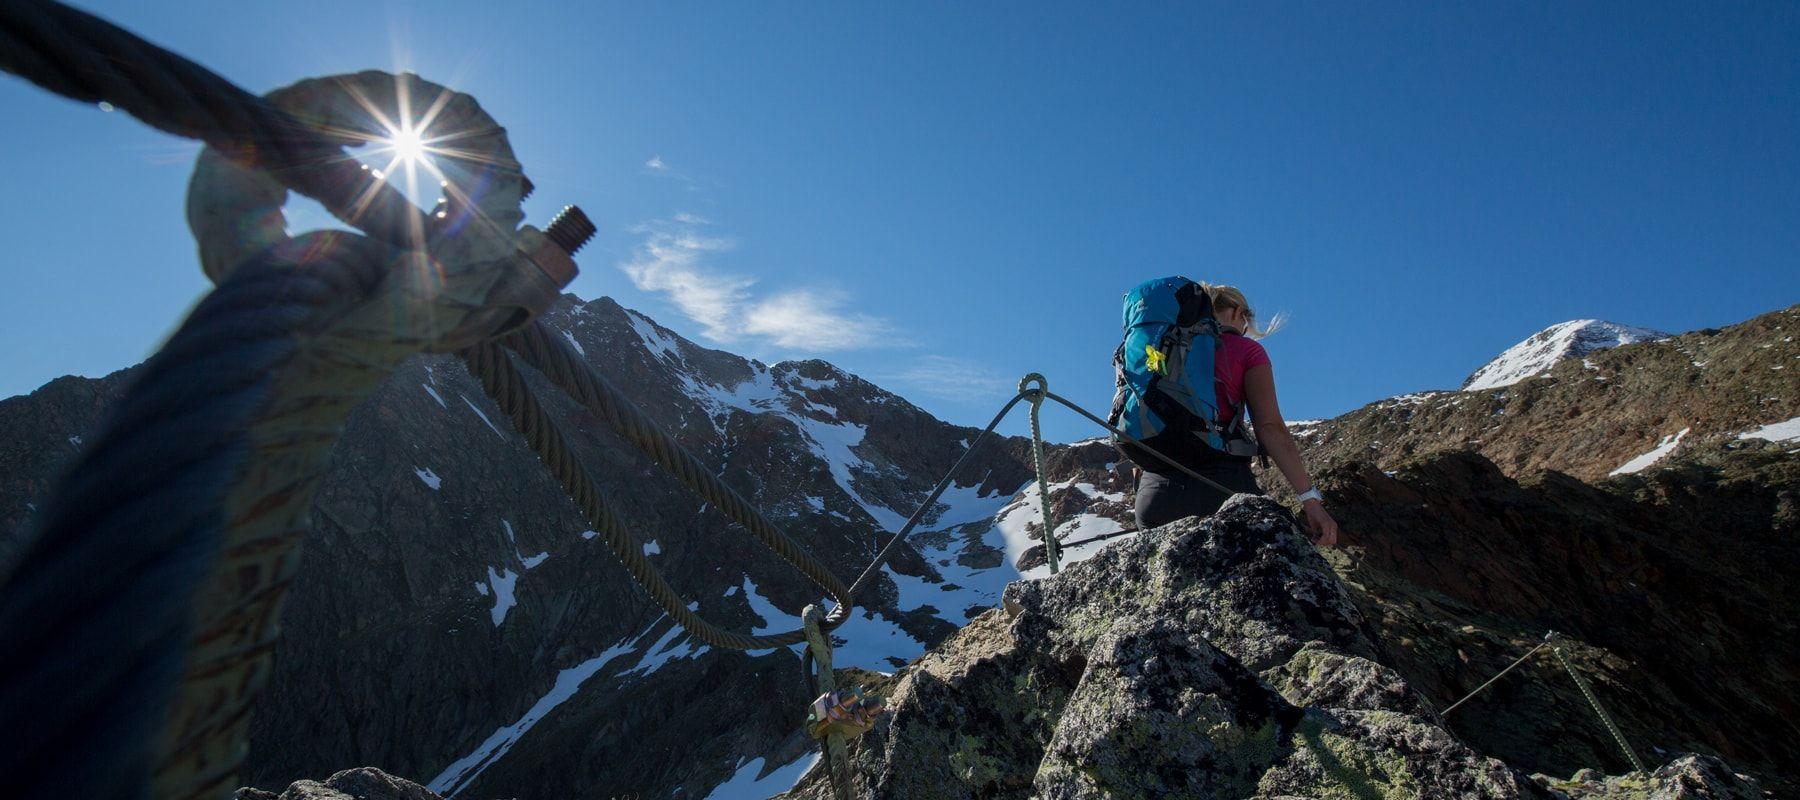 Sommerurlaub-Bergsteigen-Sölden